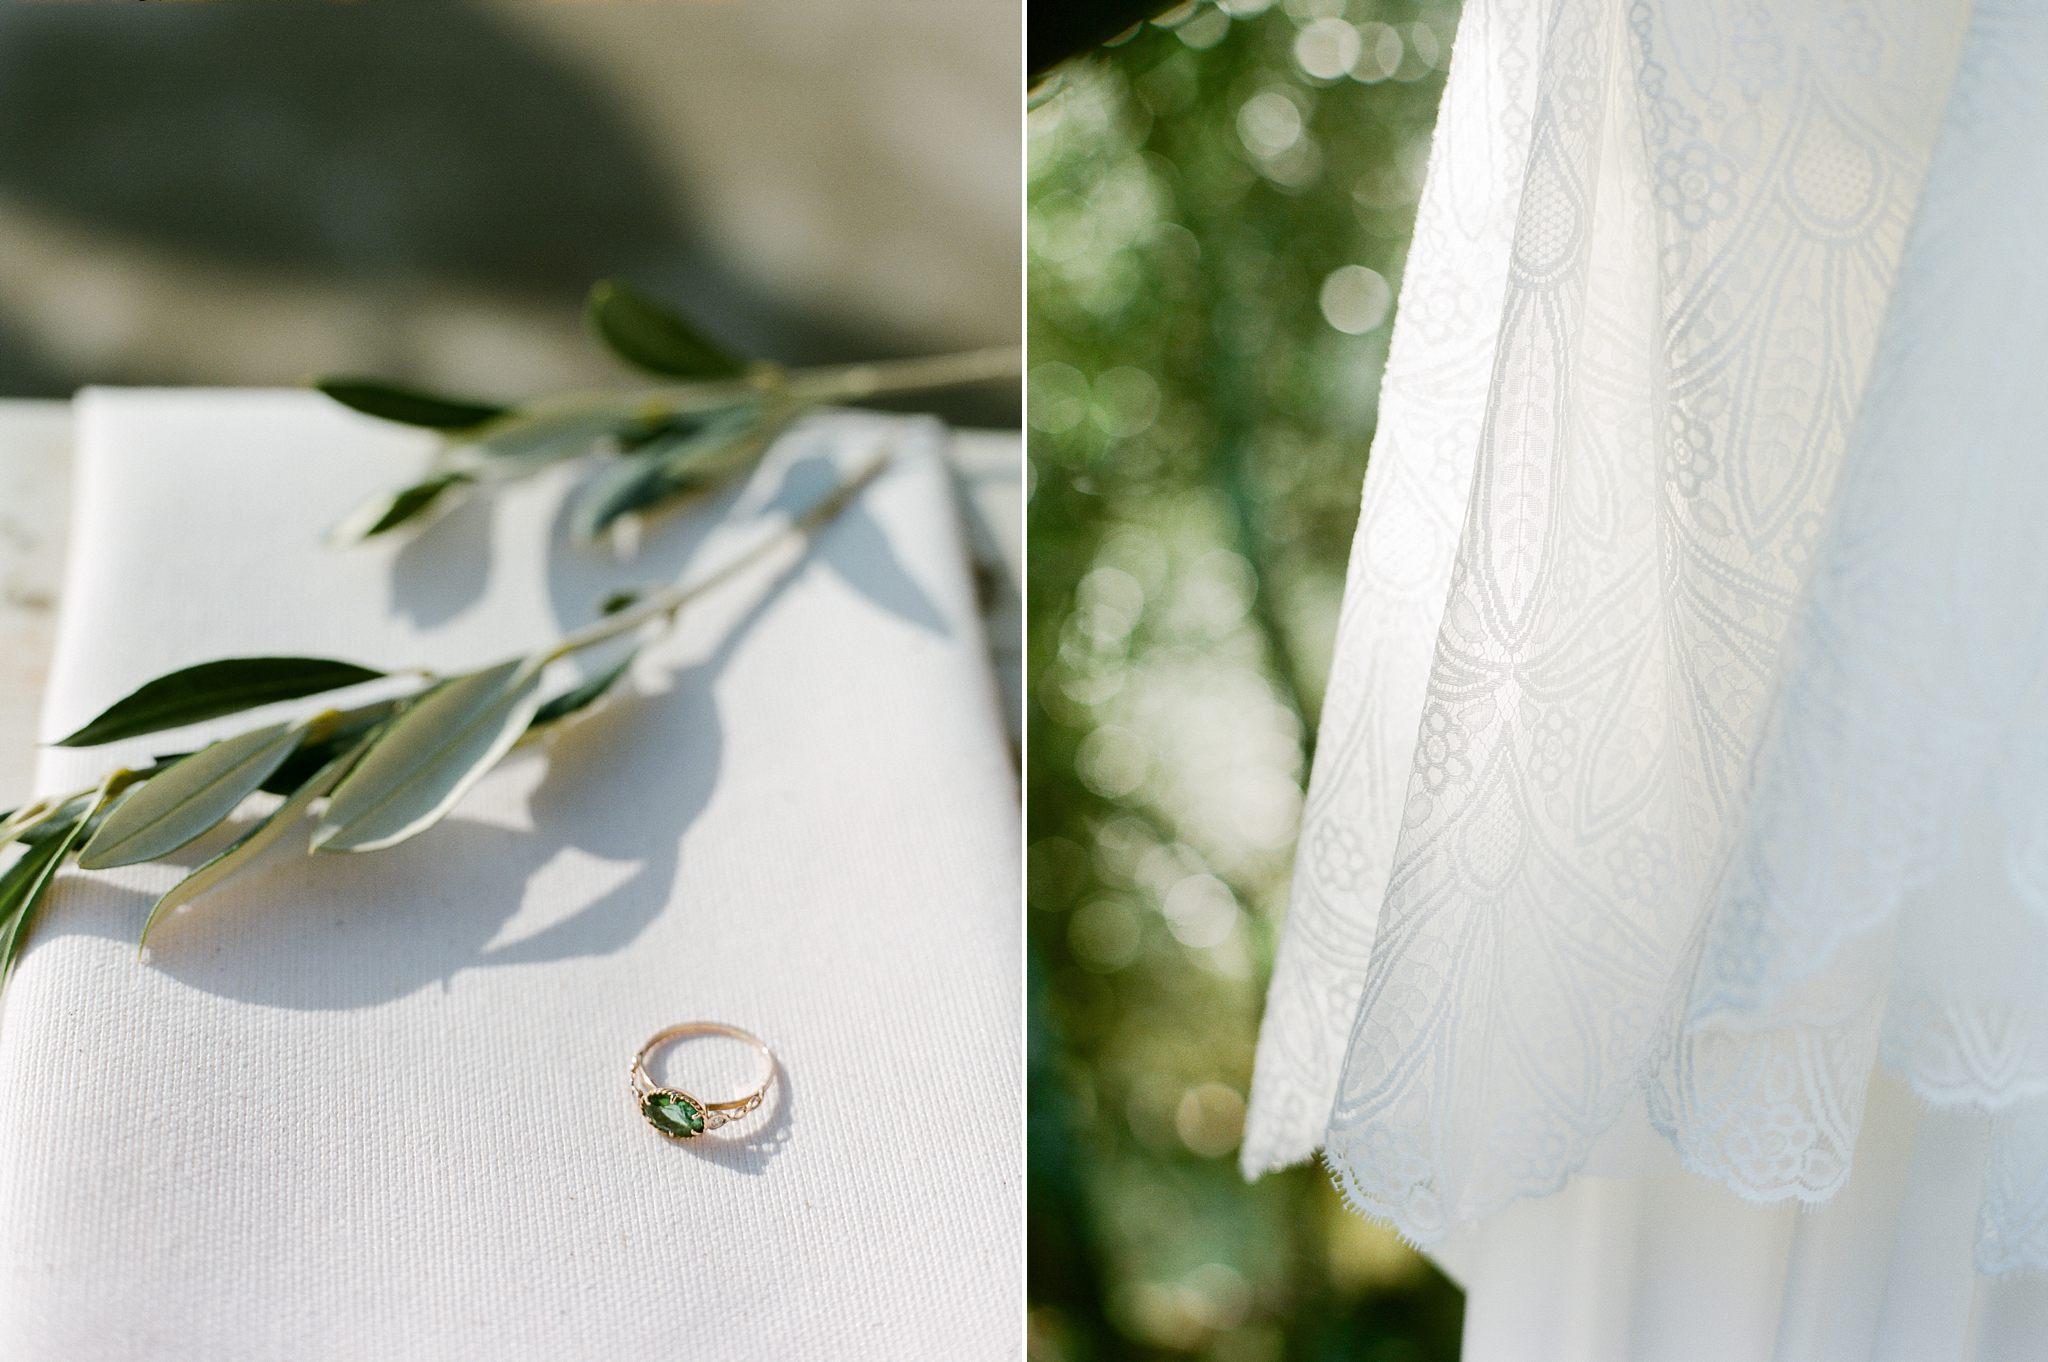 Mariage-a-la-maison-secall-hugo-hennequin-photographe-mariage-perpignan_0120.jpg